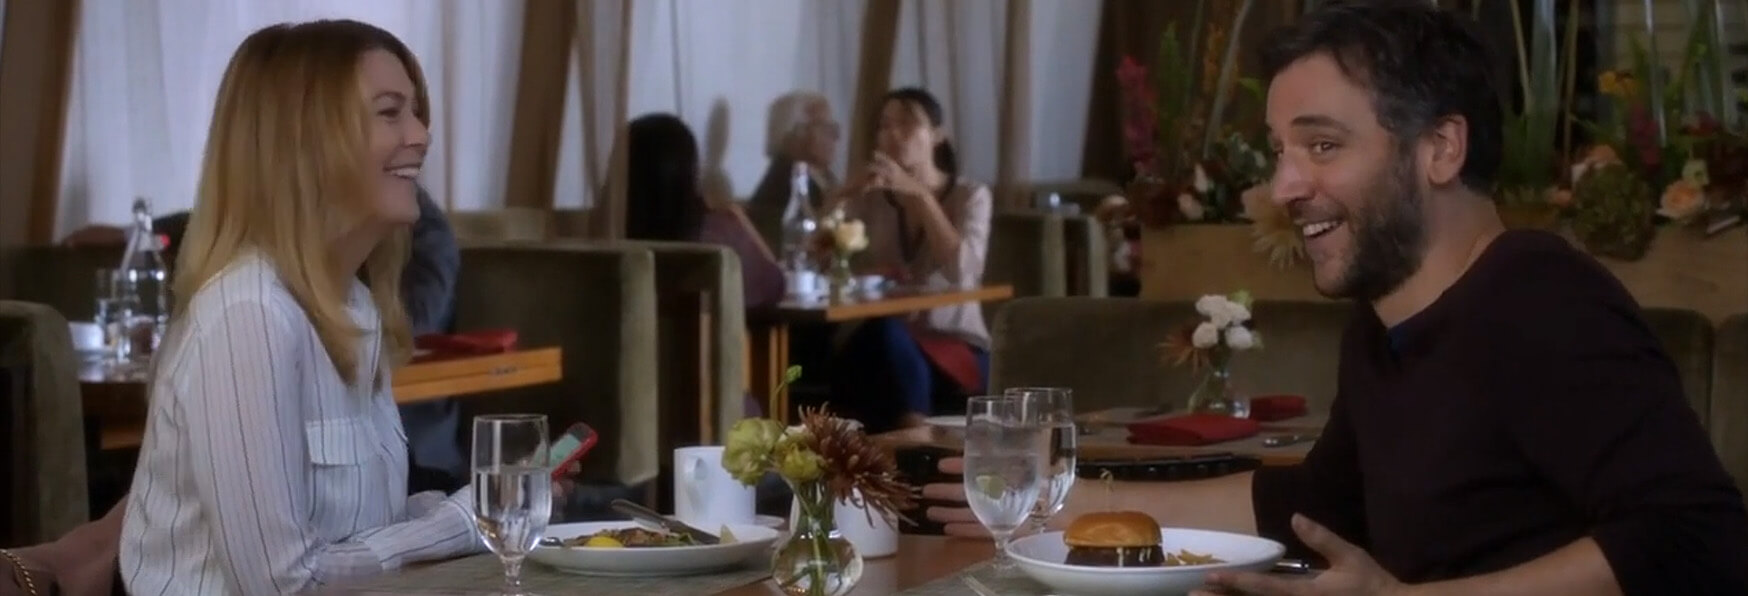 Grey's Anatomy 15x04: l'appuntamento di Meredith!